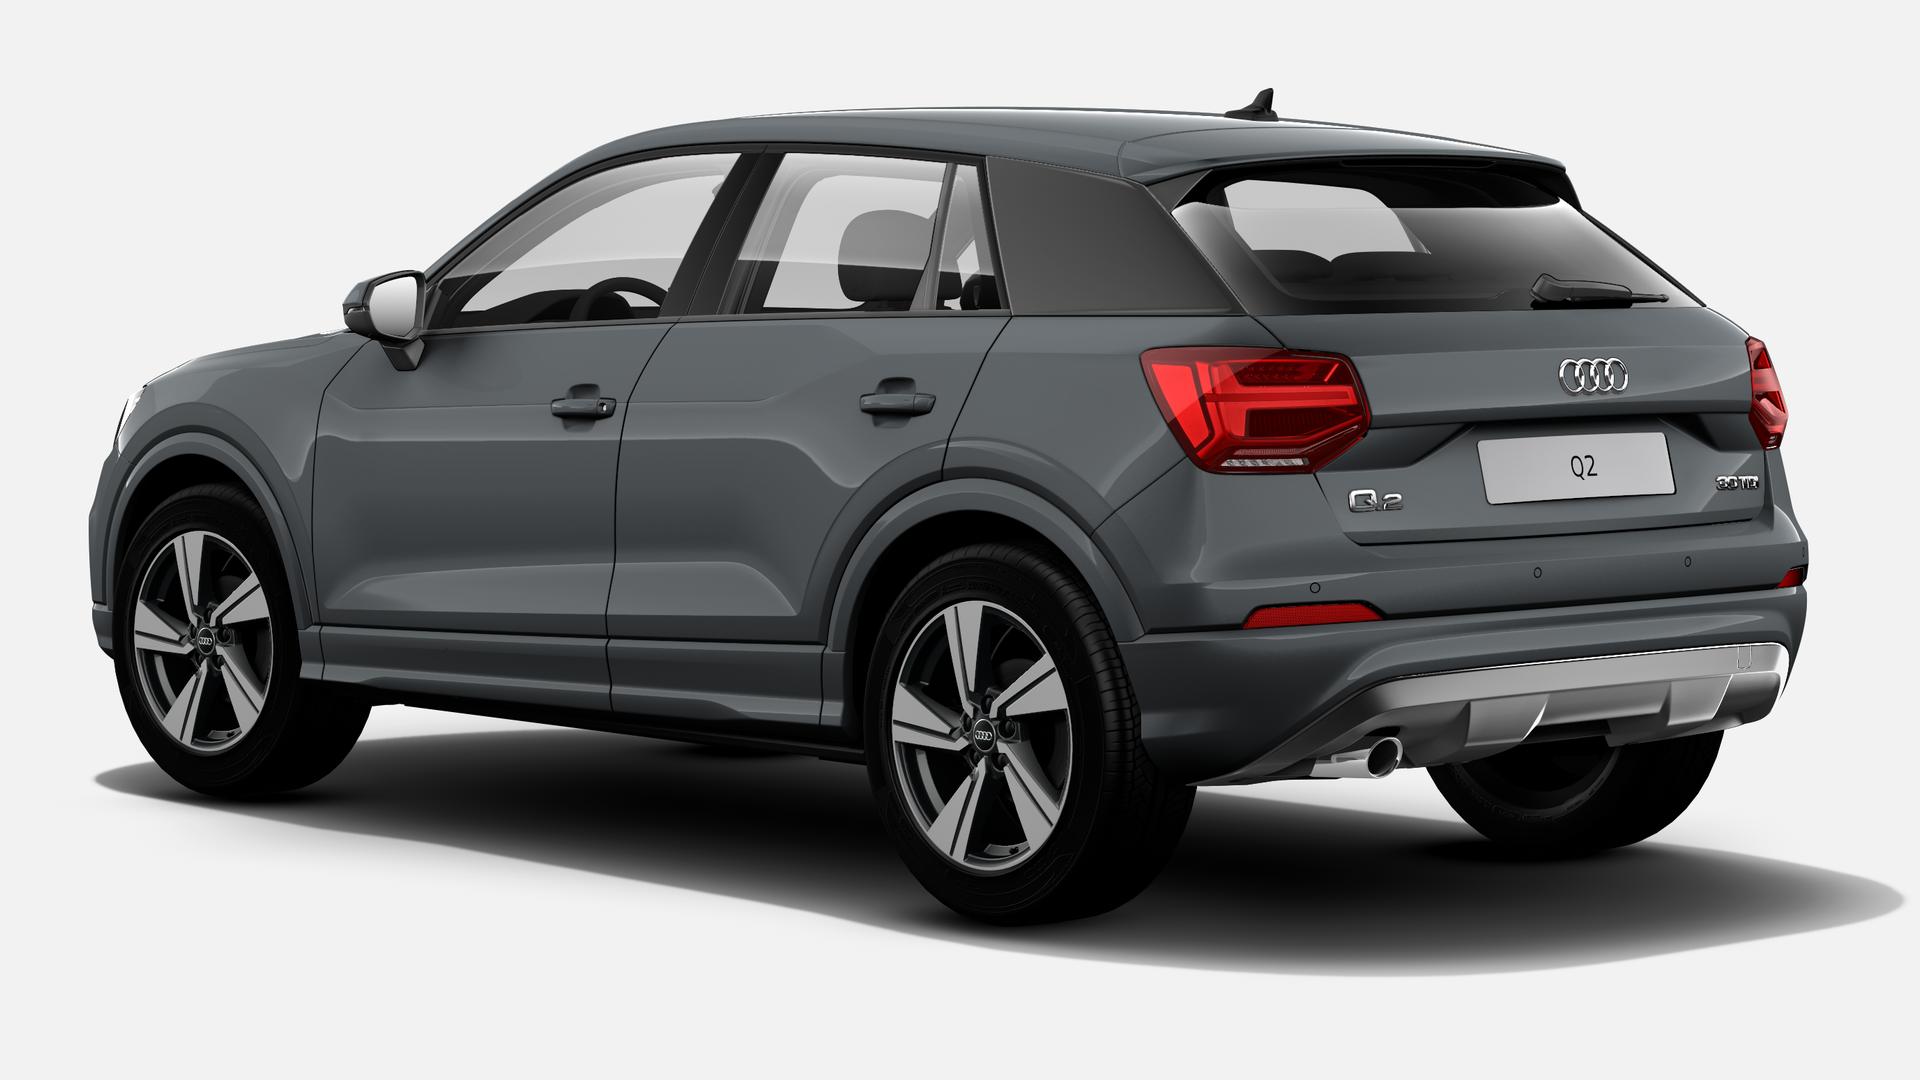 Vista Tres cuartos trasera izquierda de Audi Q2 30 TDI Design 85 kW (116 CV)